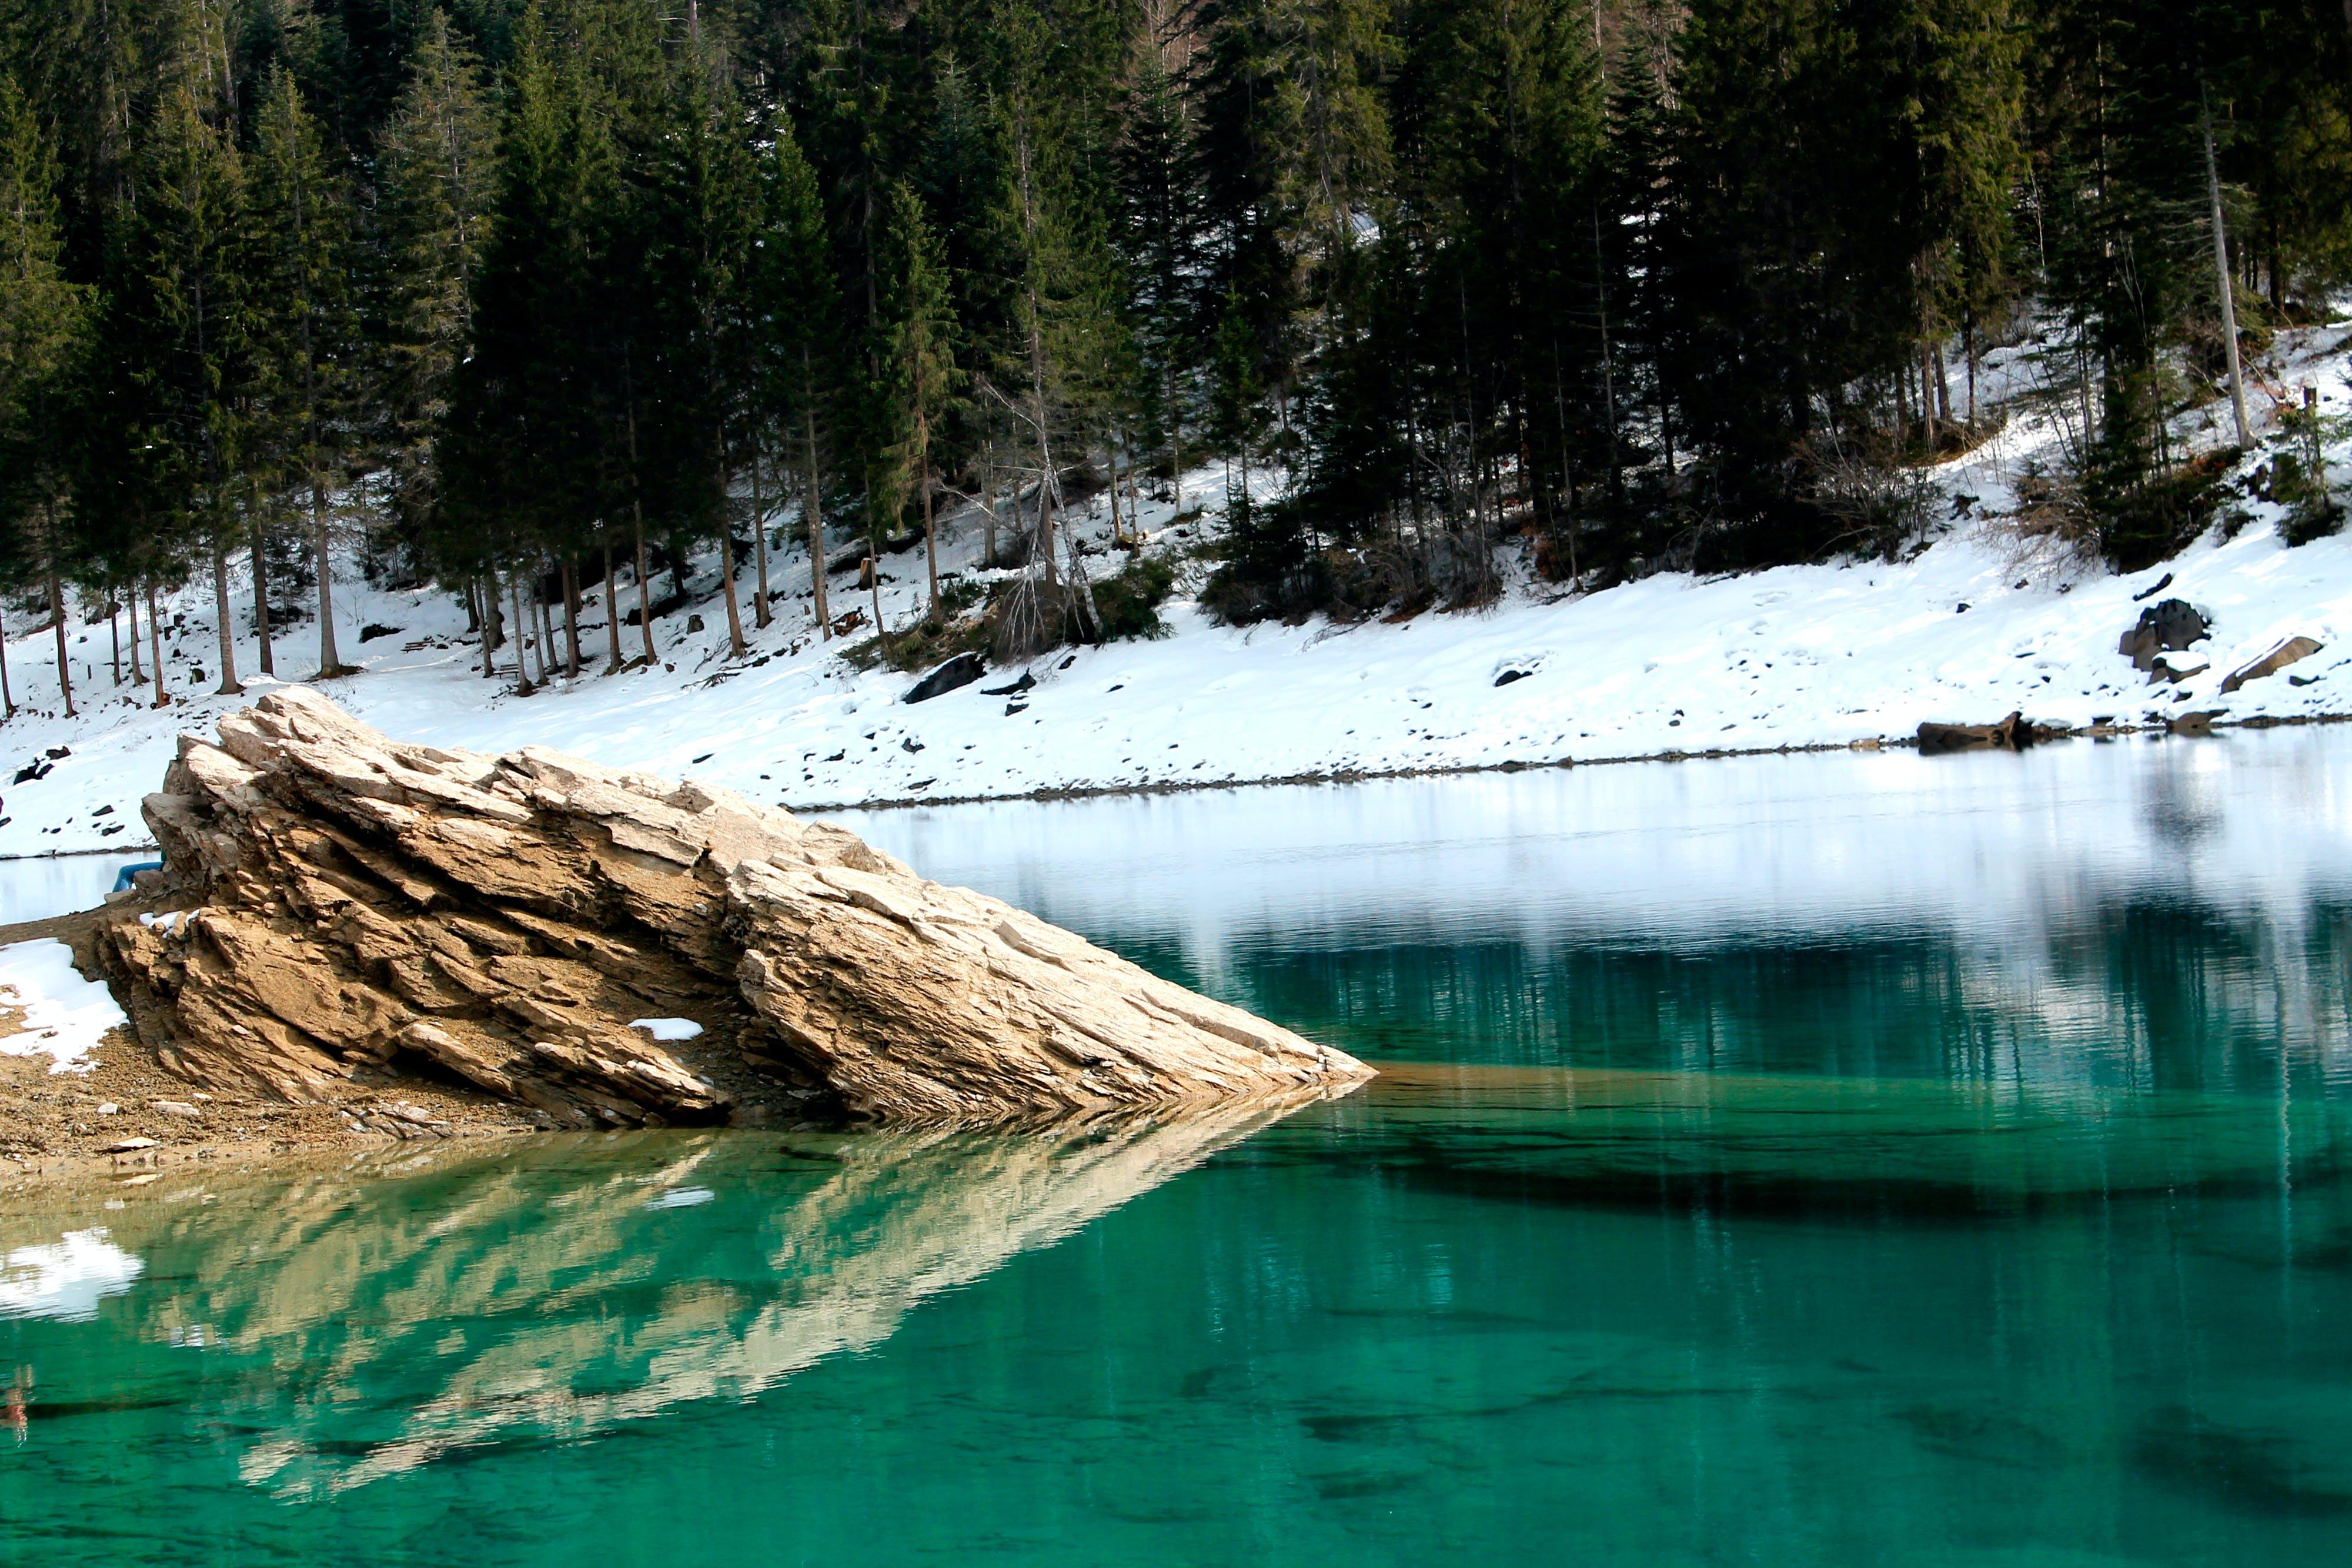 Brown Tree in Water